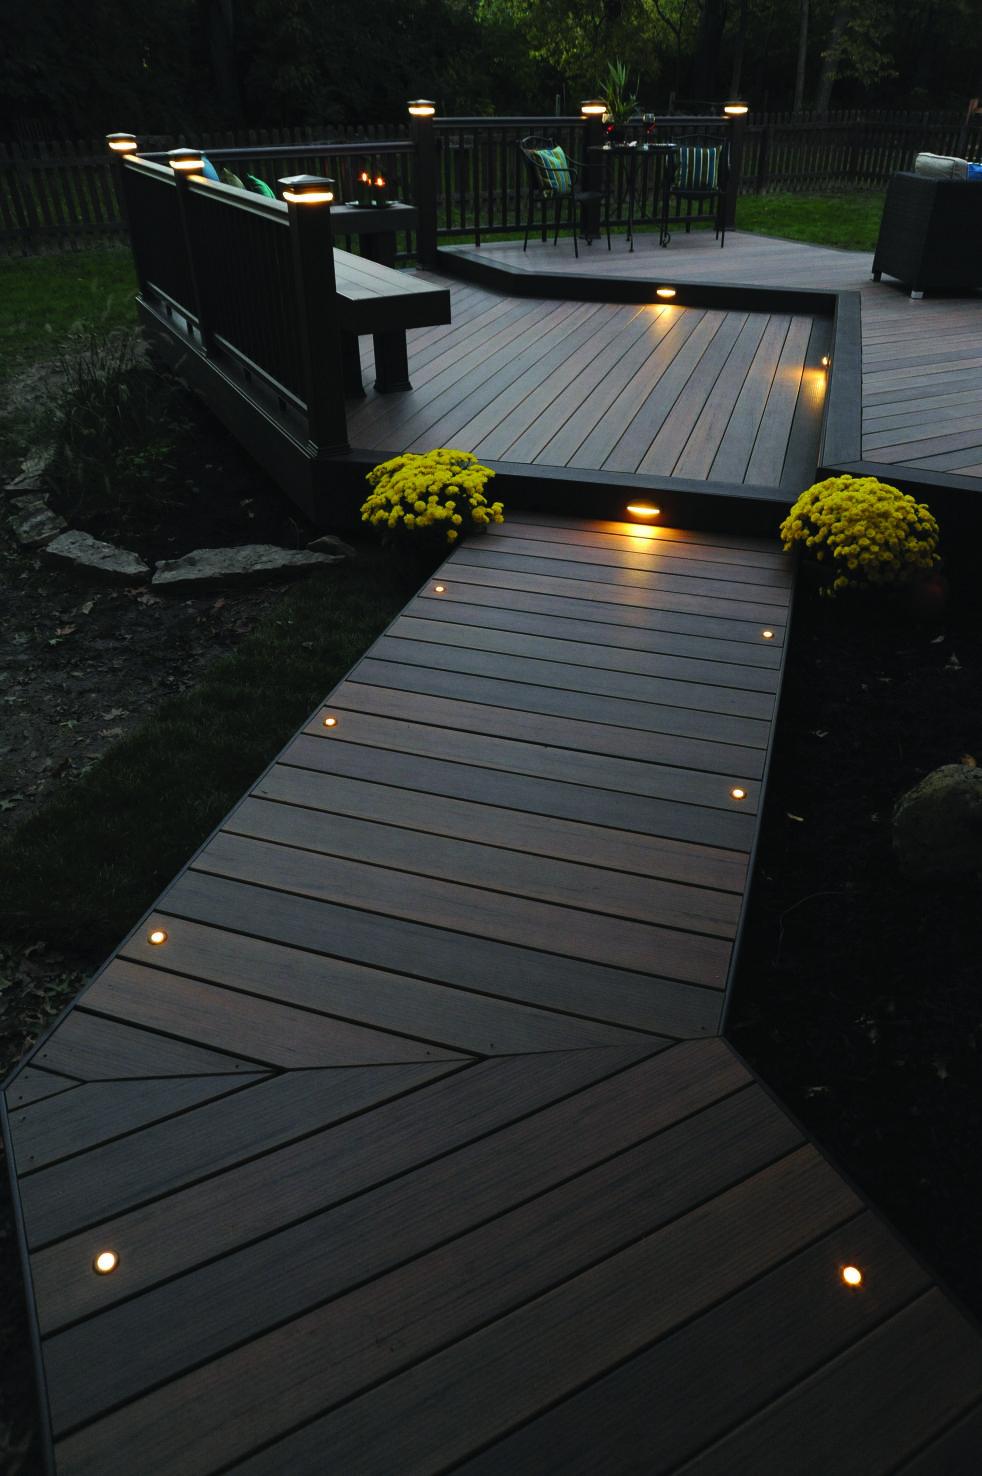 Landscape Lighting Transformer Wifi Outside House Decor Patio Deck Designs Backyard